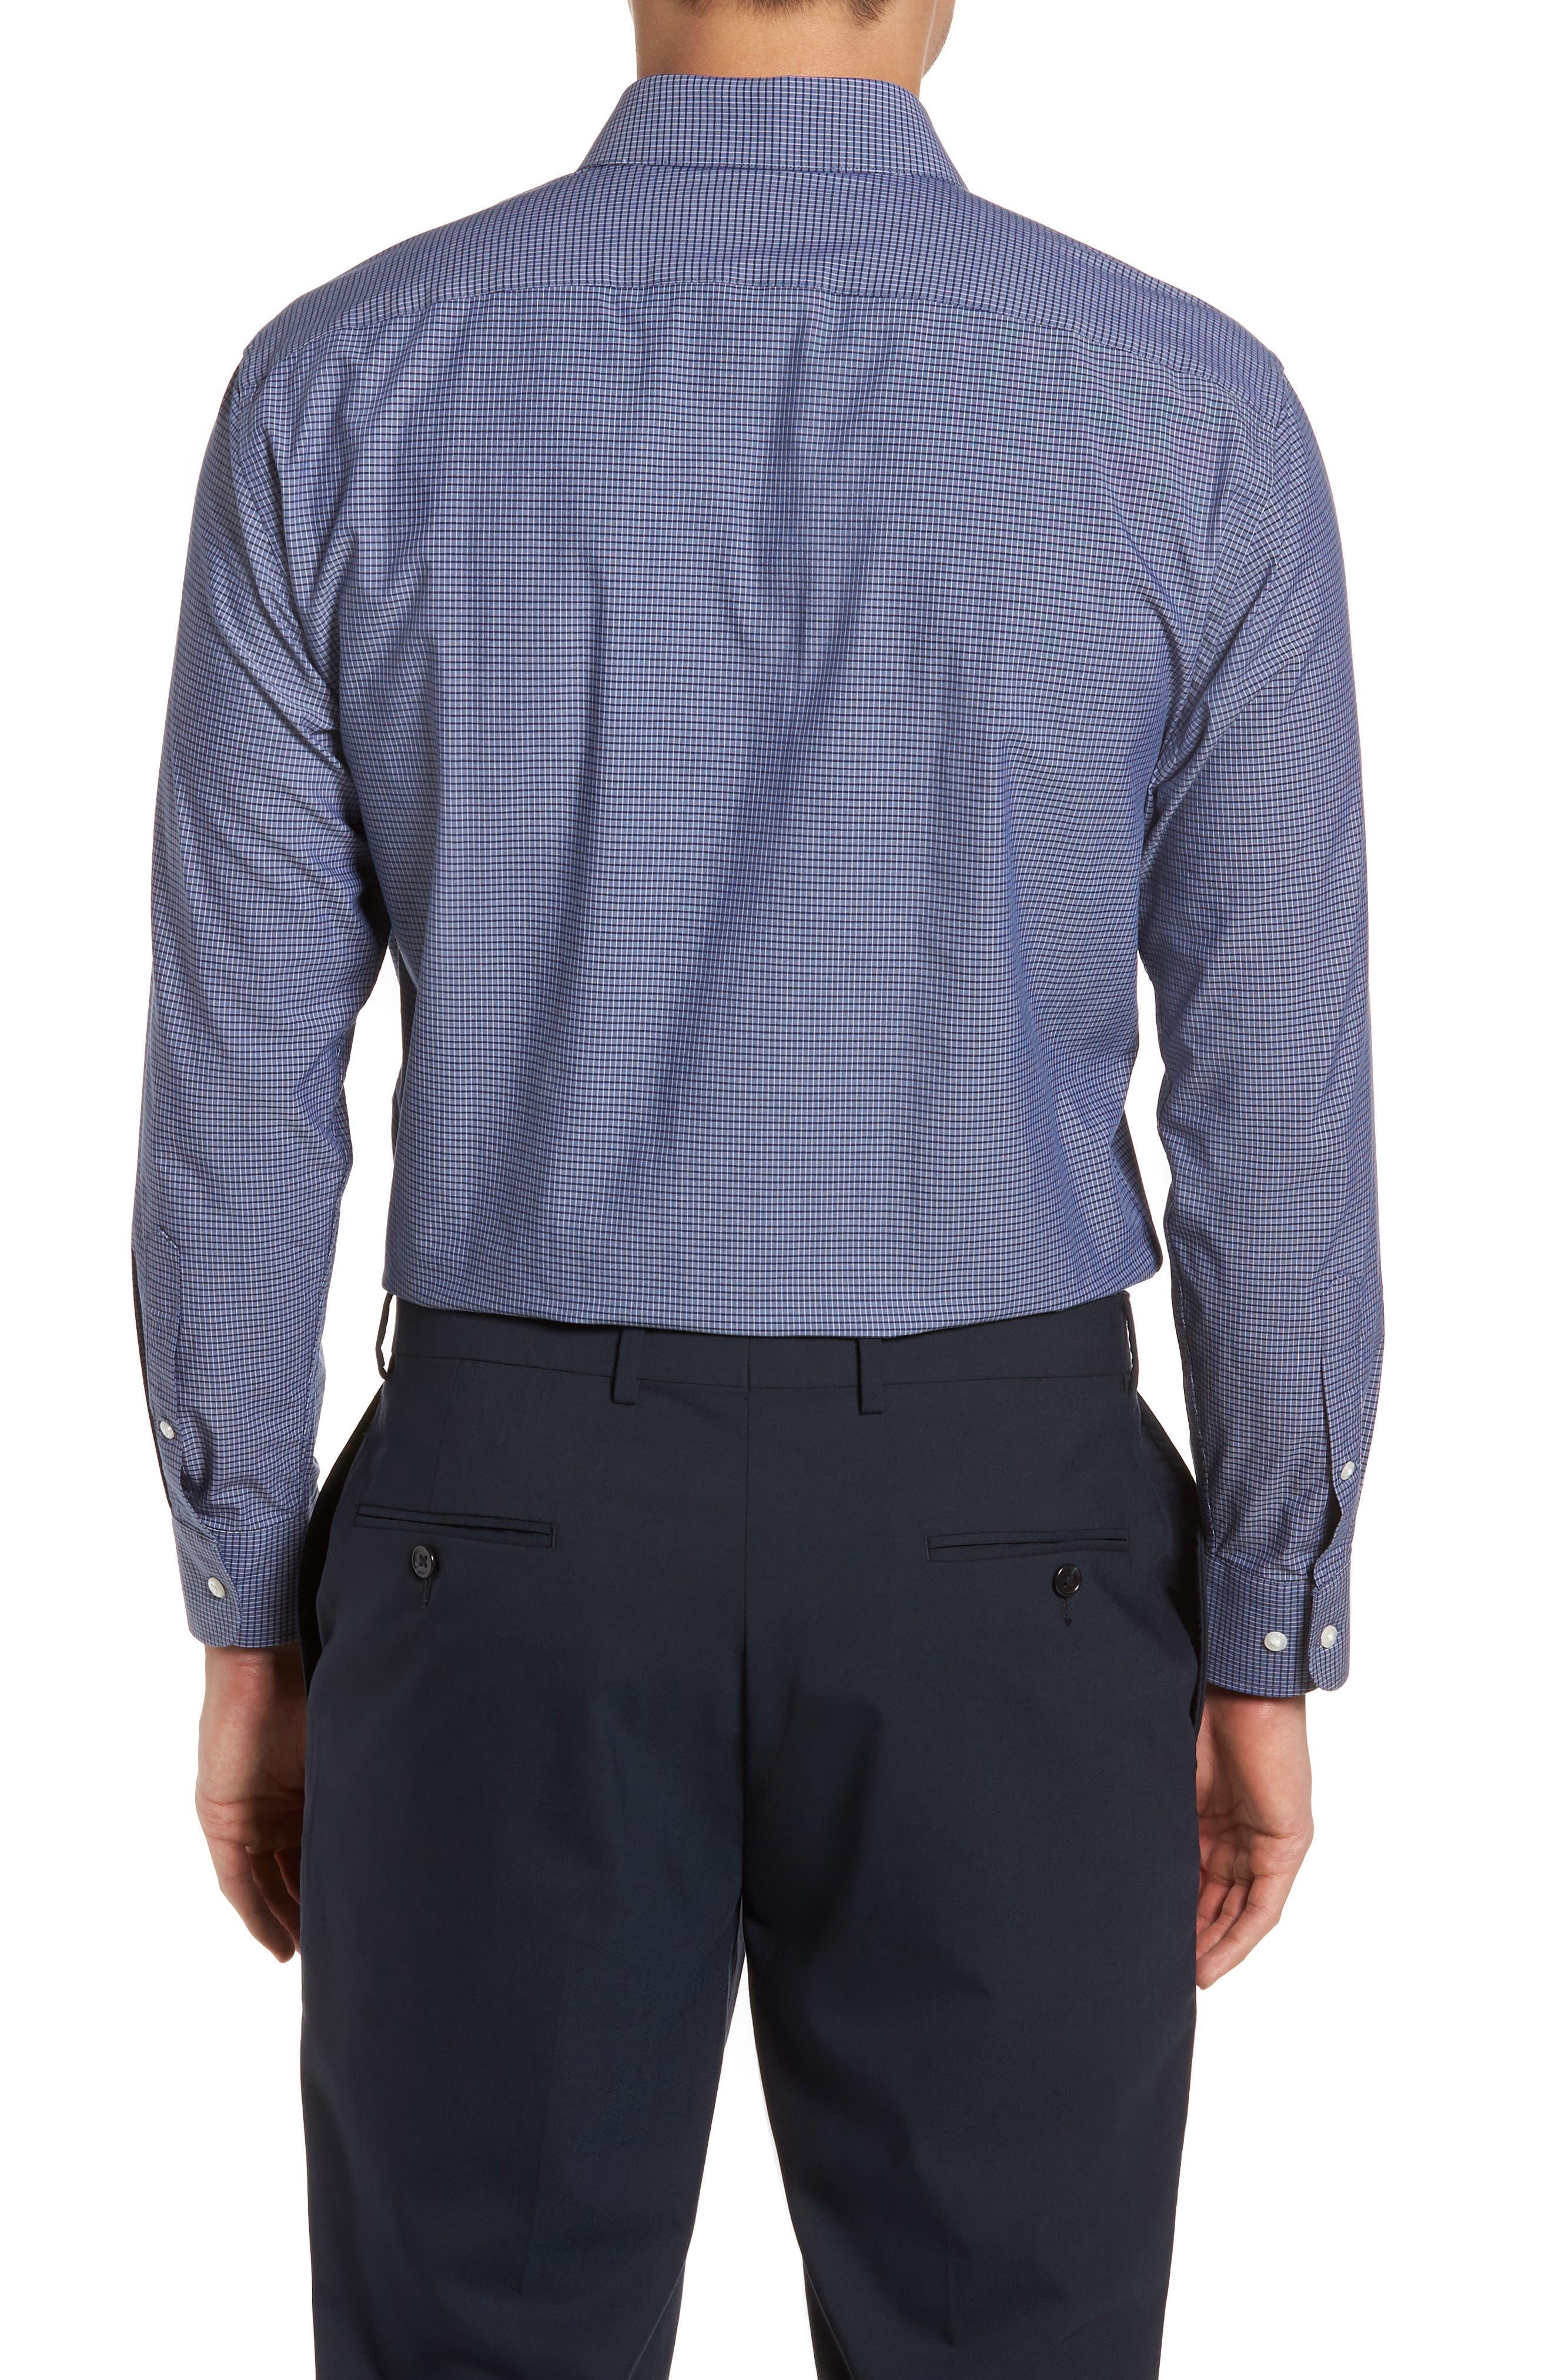 Tech-Smart Trim Fit Stretch Check Dress Shirt,                             Alternate thumbnail 3, color,                             410